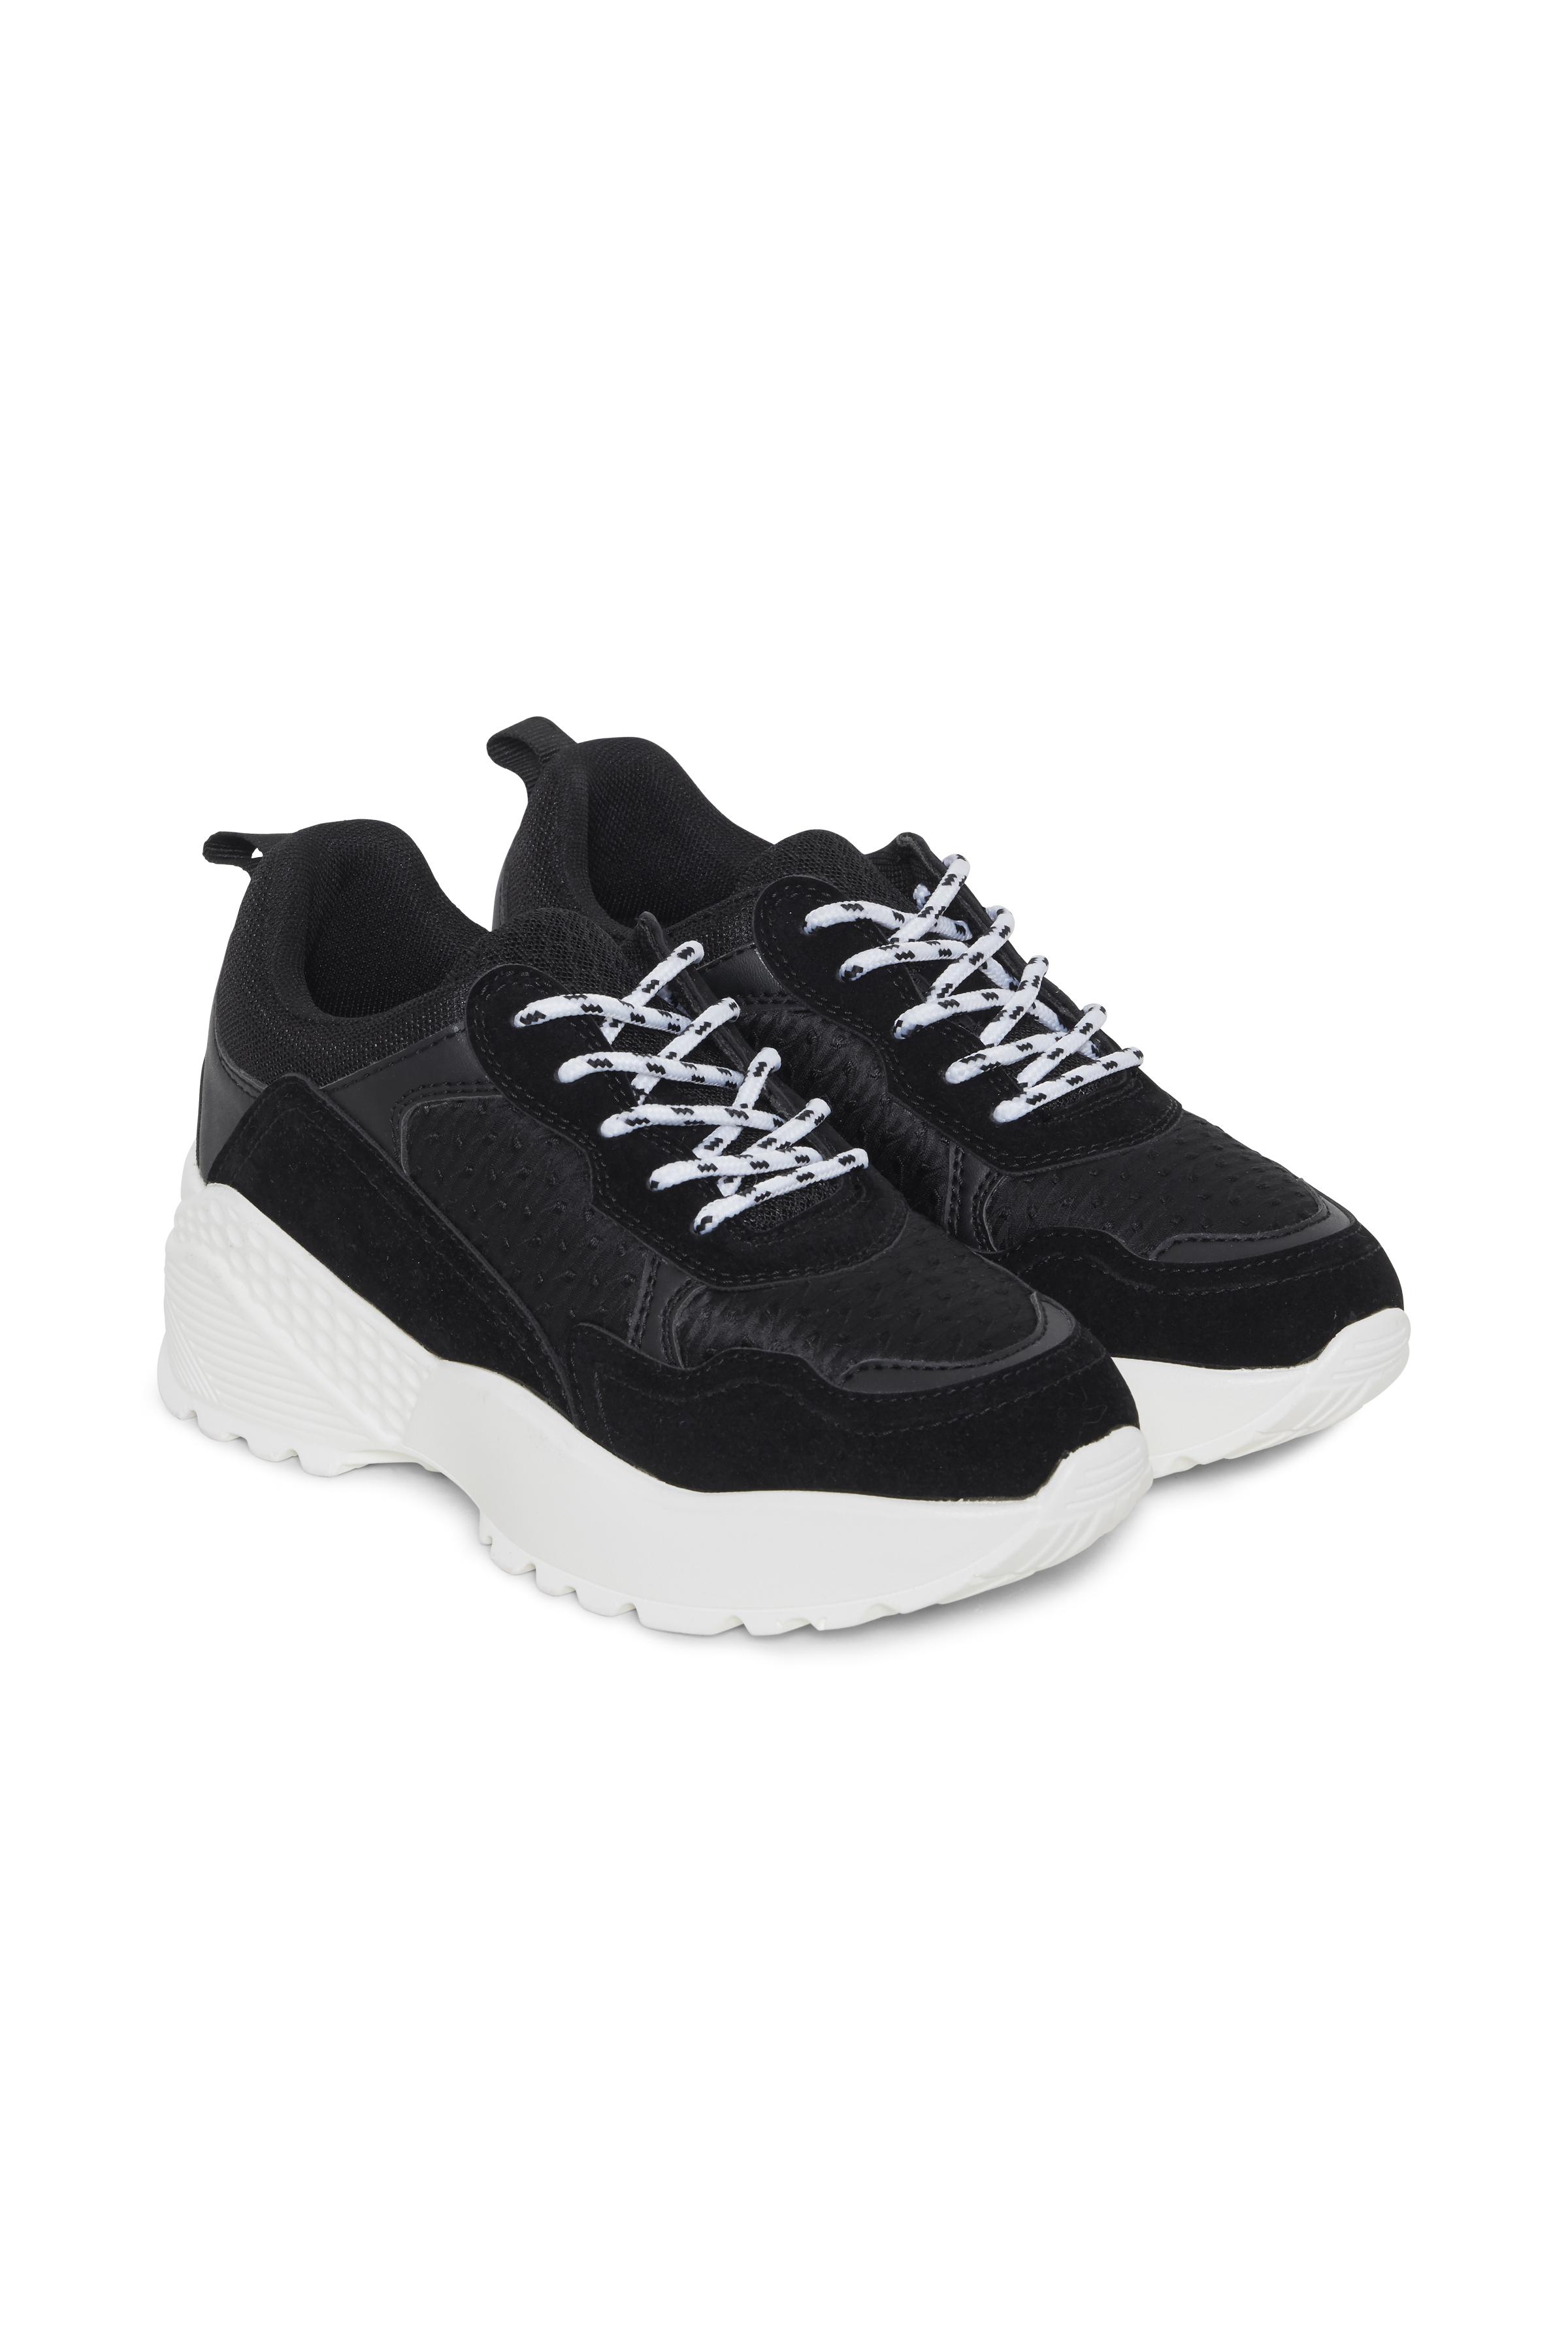 Image of   Ichi - accessories Dame Sneakers - Sort